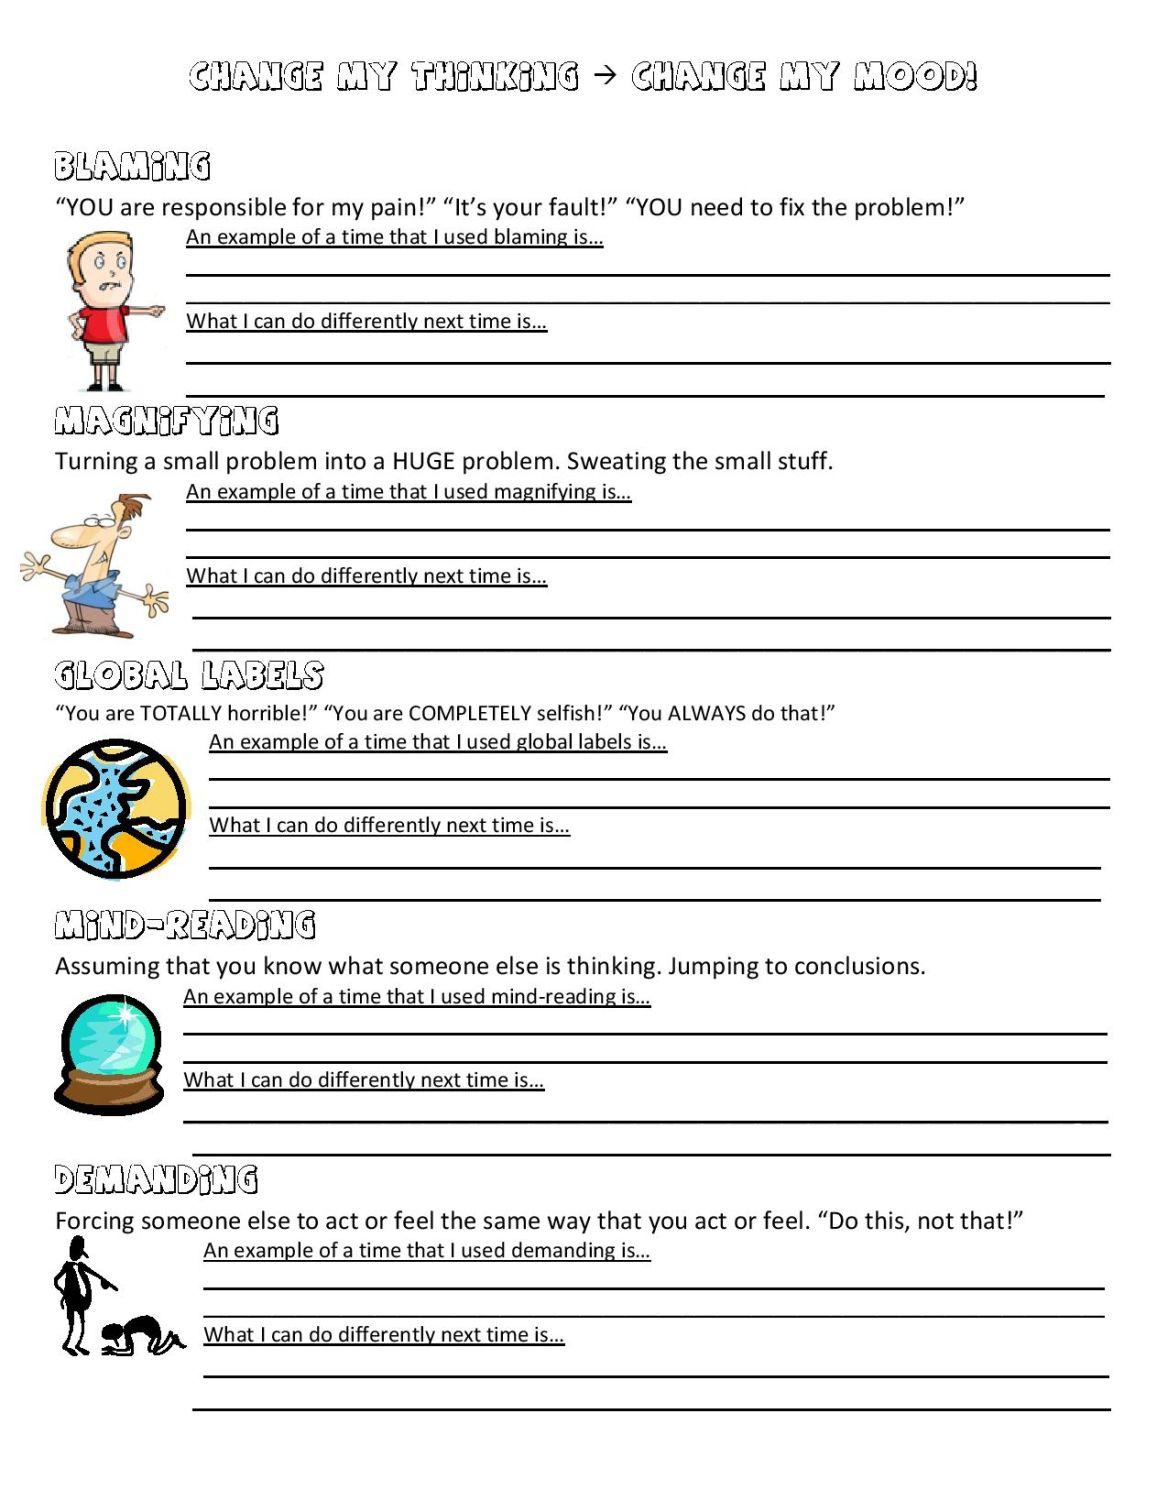 Worksheets Anger Management Worksheets anger management worksheets baskentmuhendislik child therapy baskentmuhendislik